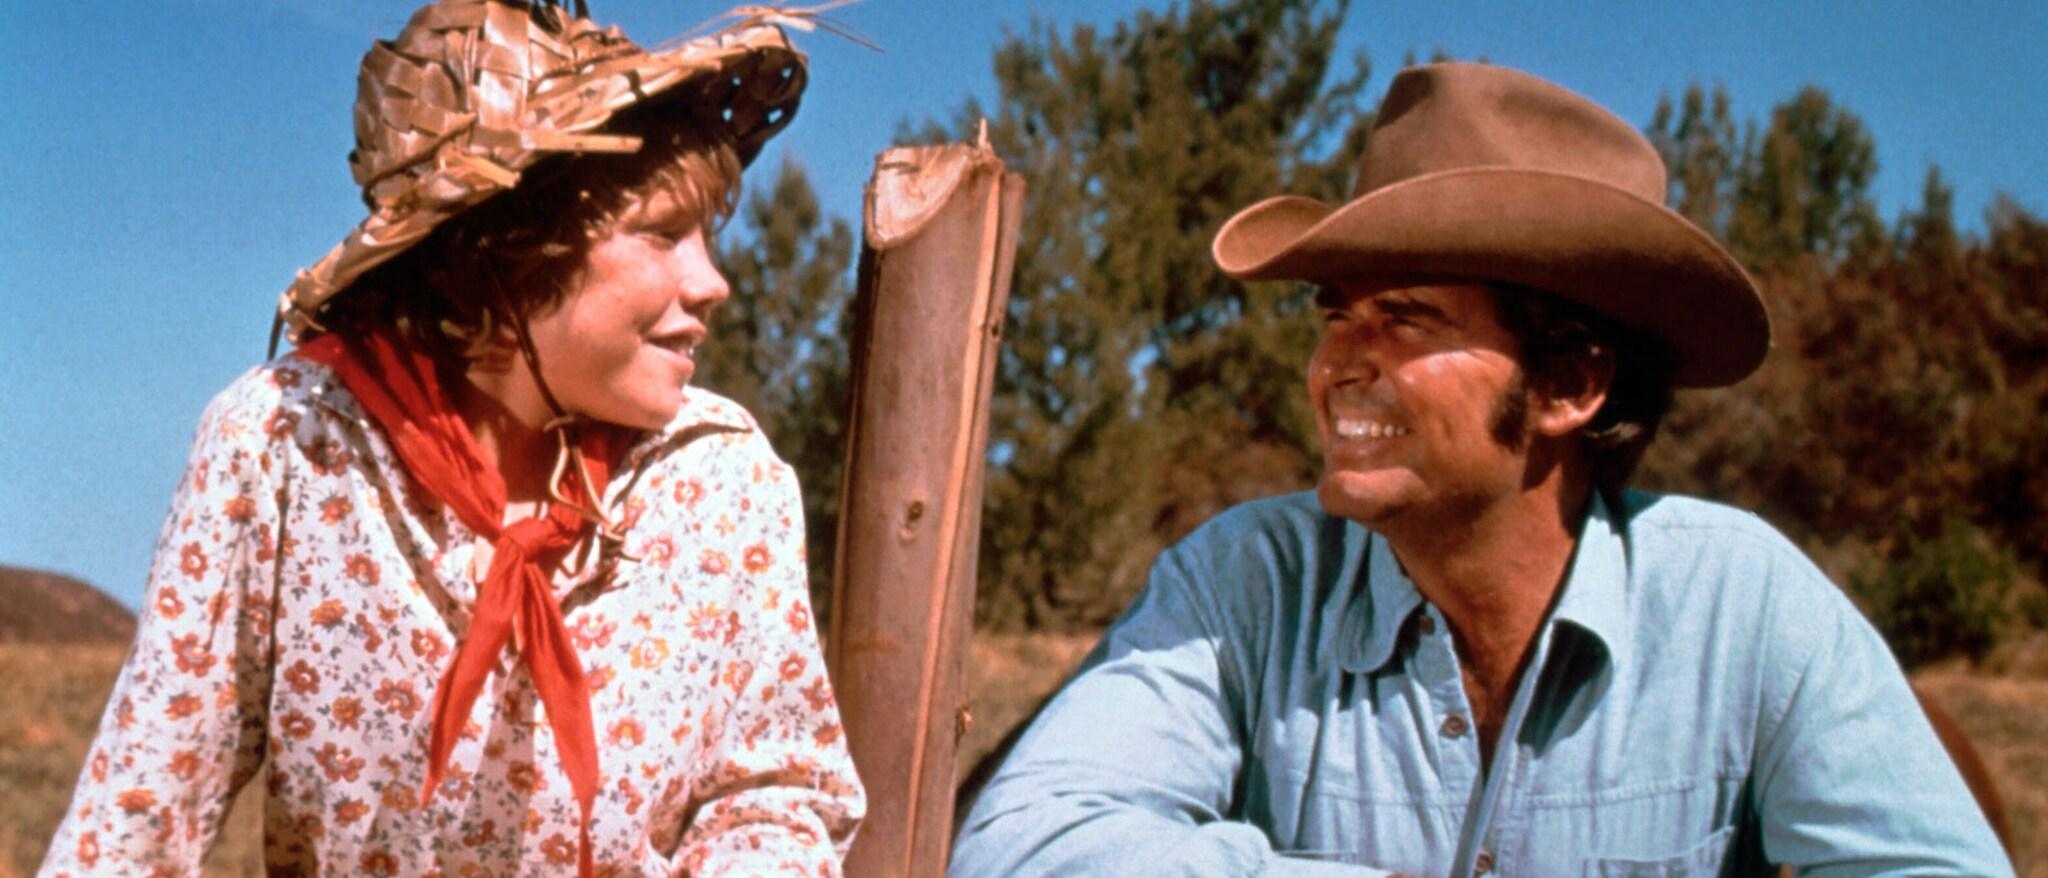 The Castaway Cowboy Hero